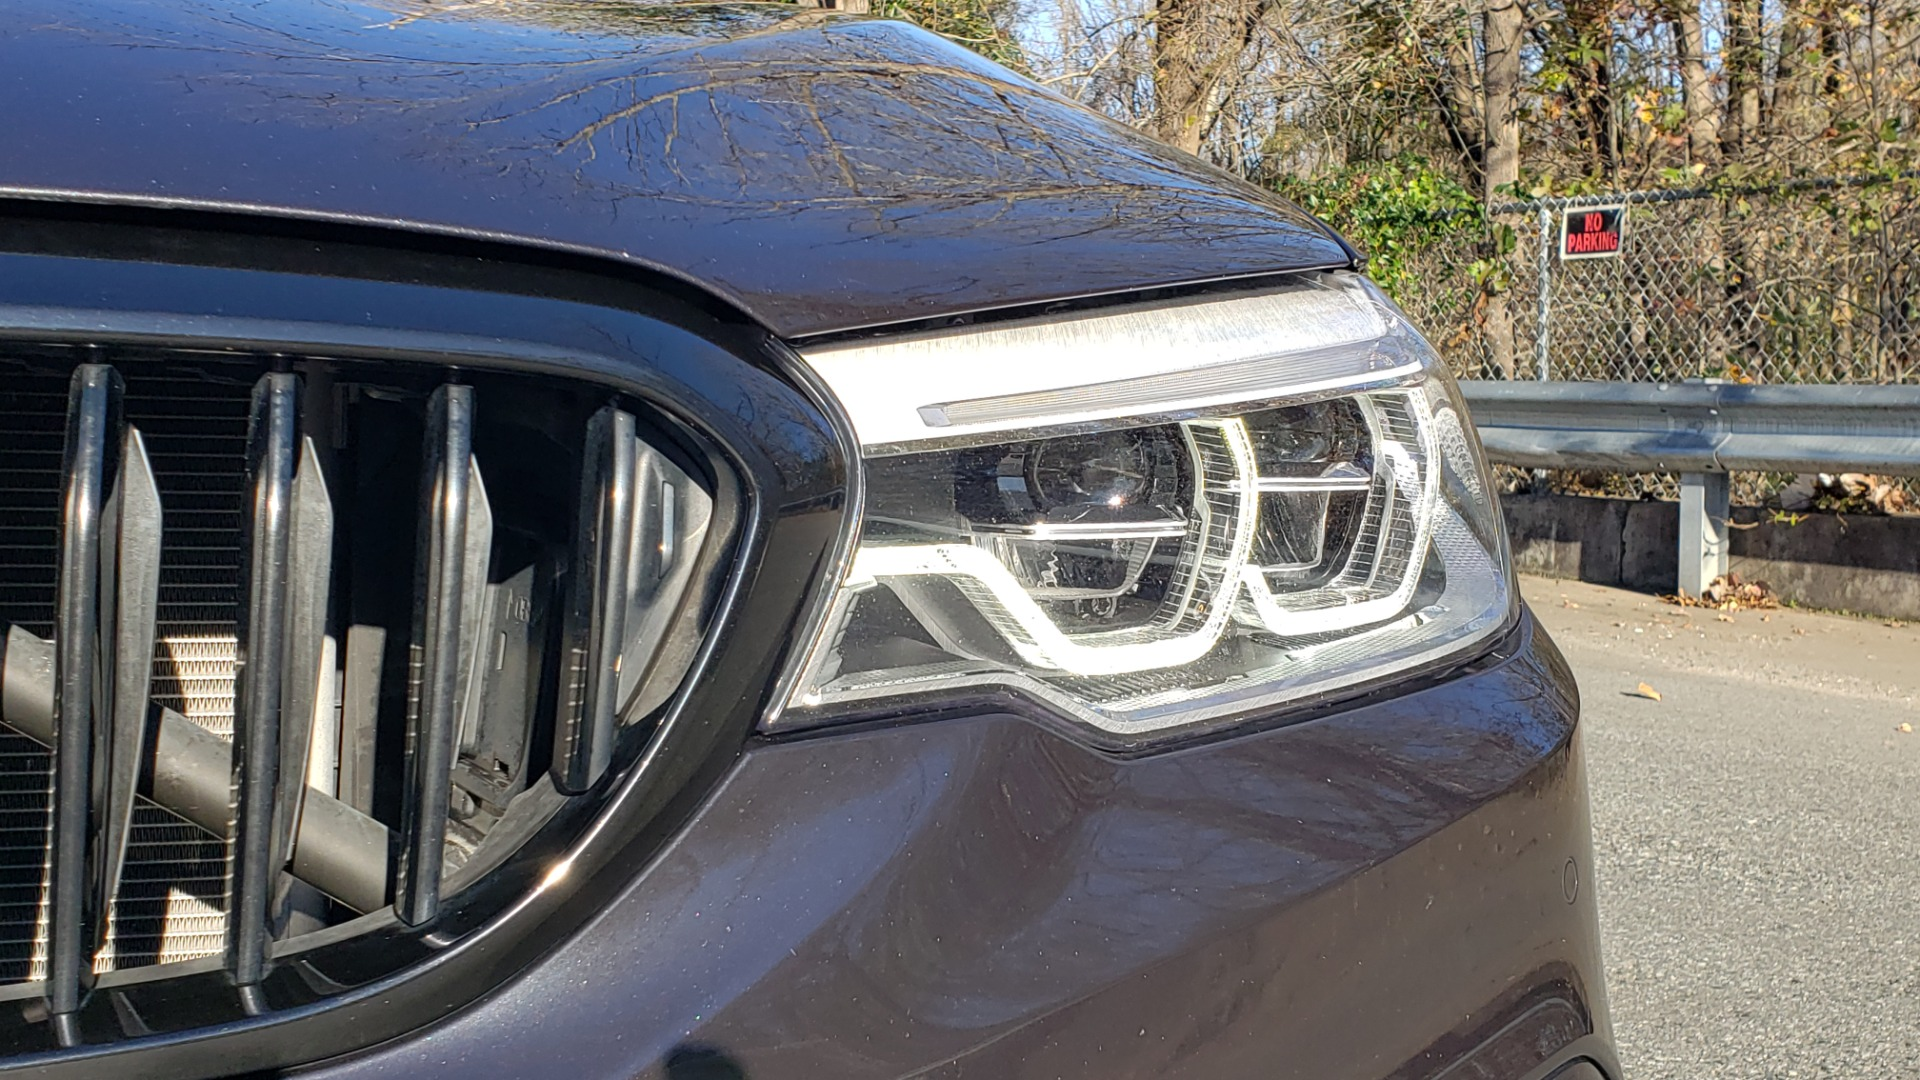 Used 2018 BMW 5 SERIES 540I M-SPORT / DRVR ASST / EXEC PKG / NAV / SUNROOF / HUD / REARVIEW for sale Sold at Formula Imports in Charlotte NC 28227 20